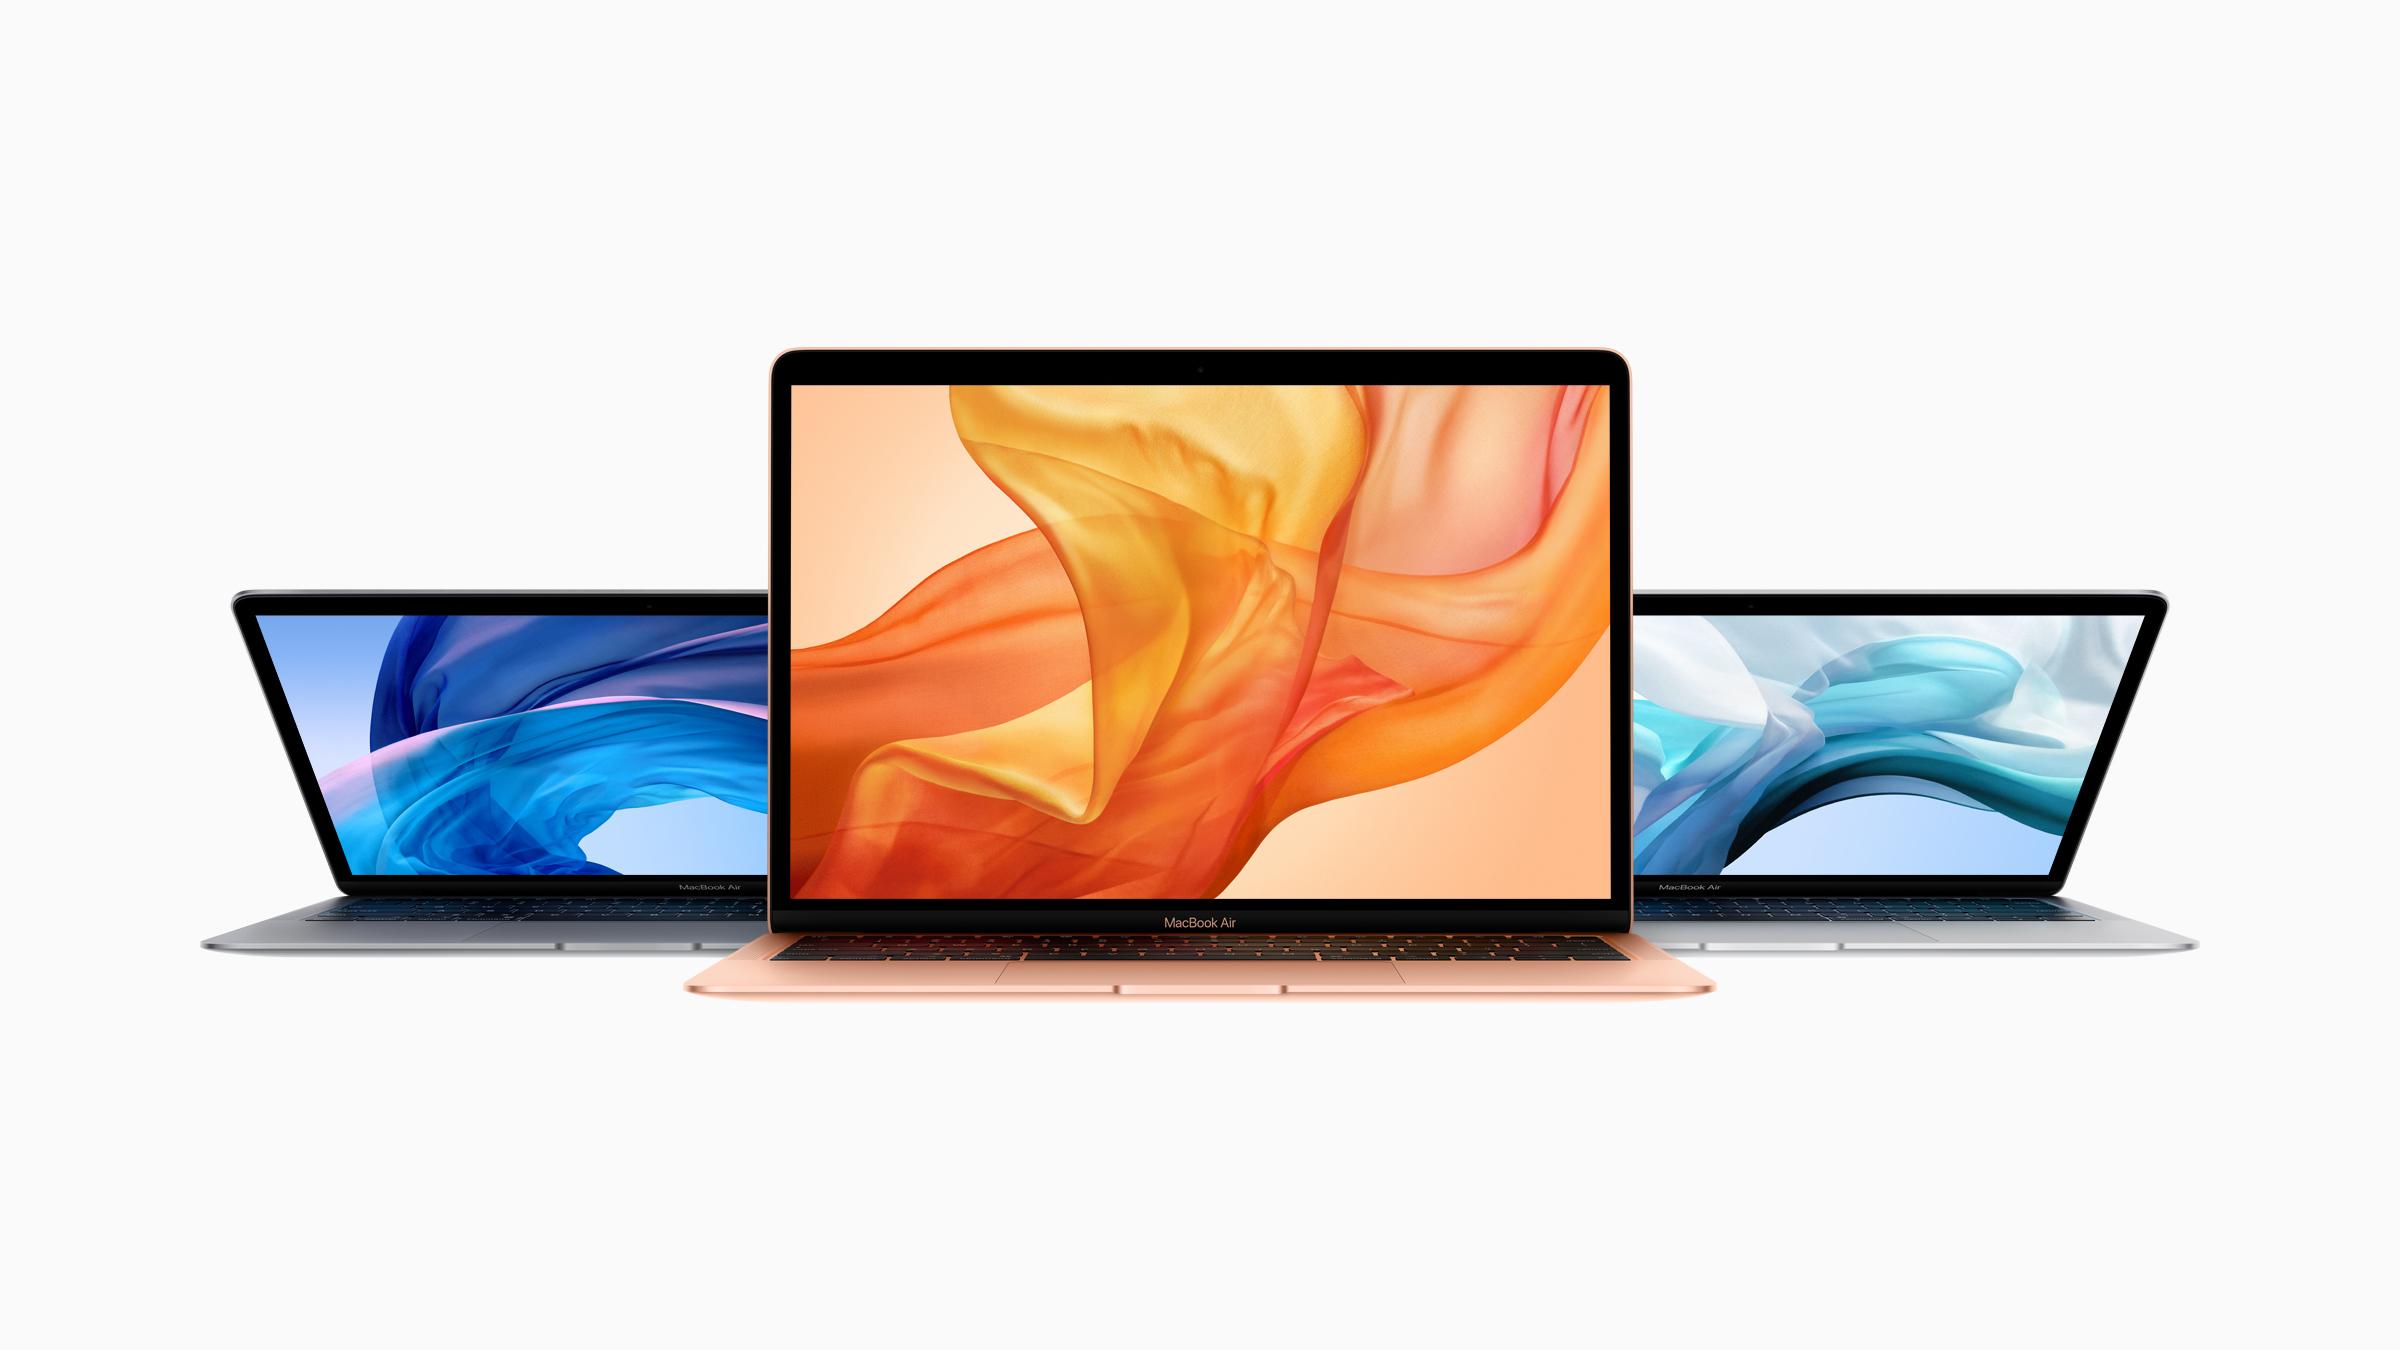 Apple MacBook Air 2018 vs MacBook Air 2015